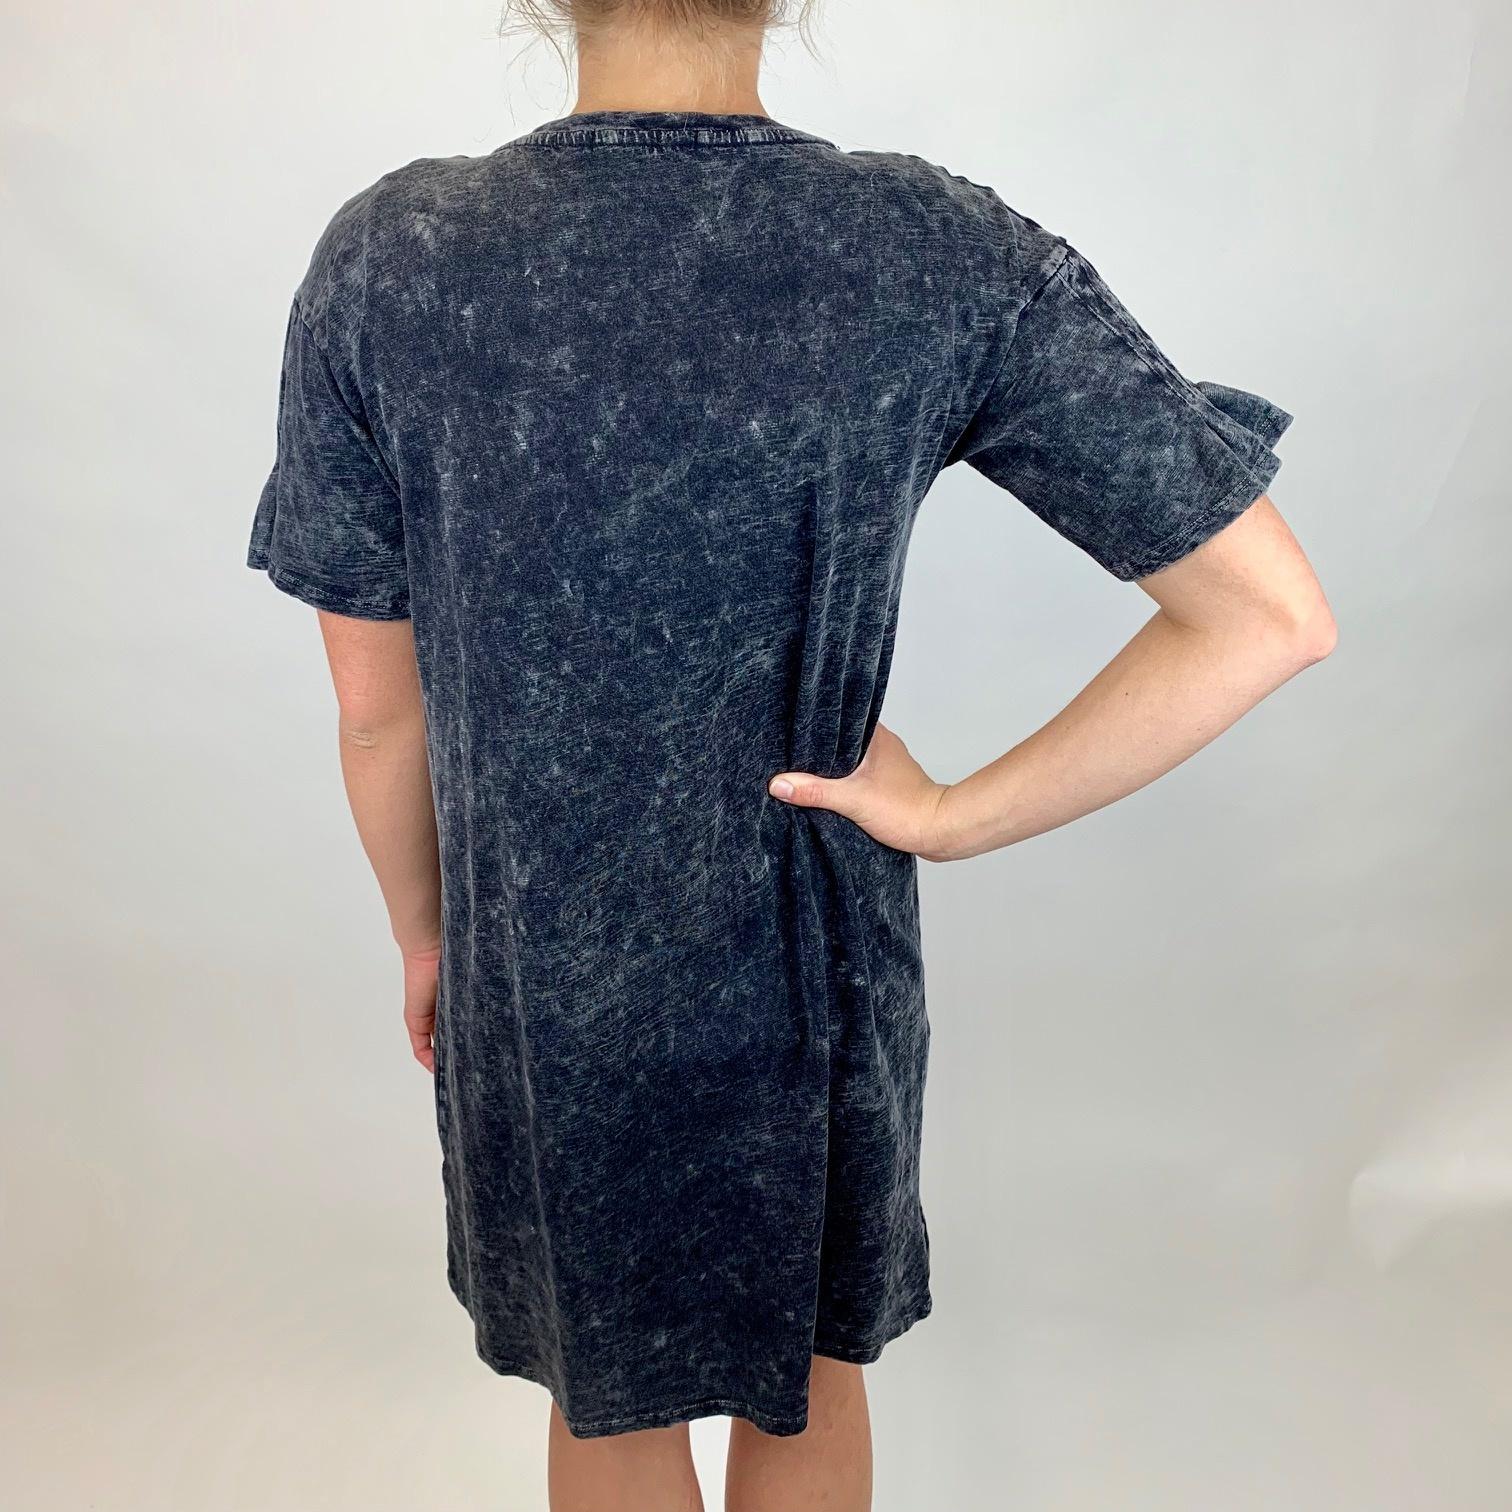 Mod-o-doc Mod-O-Doc T Shrt Dress w/Pintk BLK 439-87759